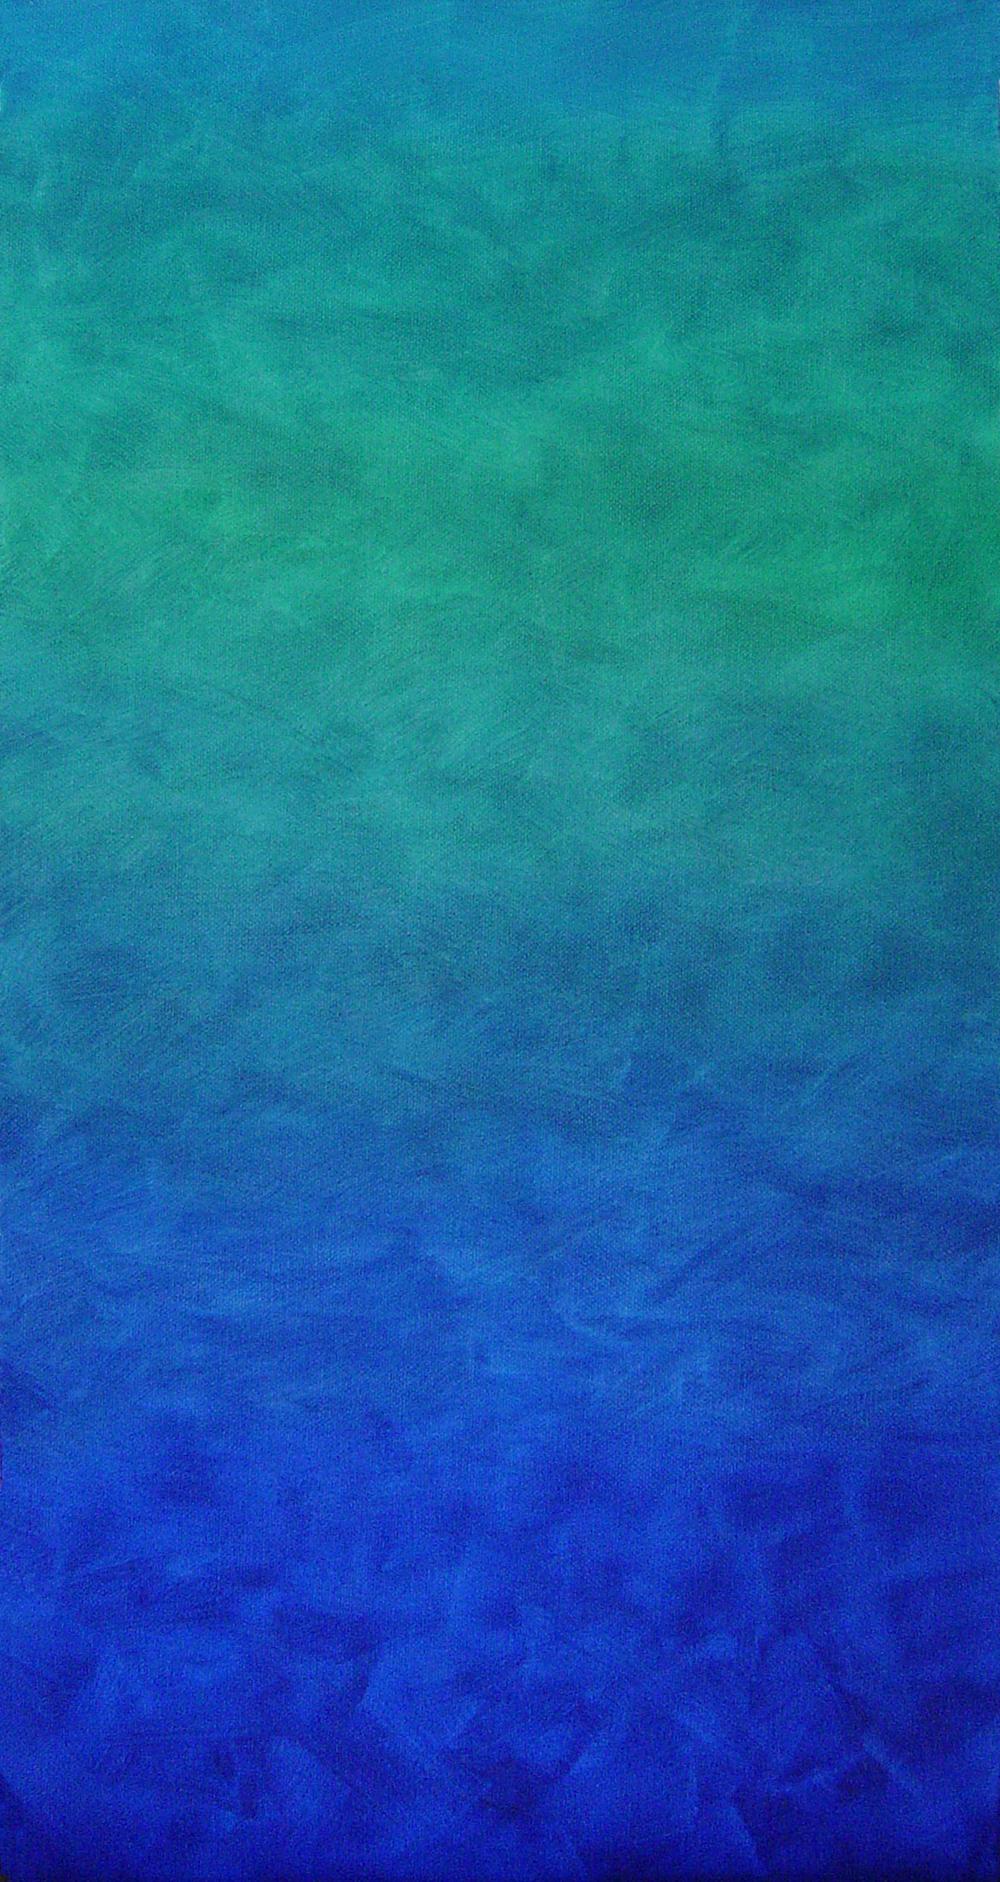 blue green turq.jpg